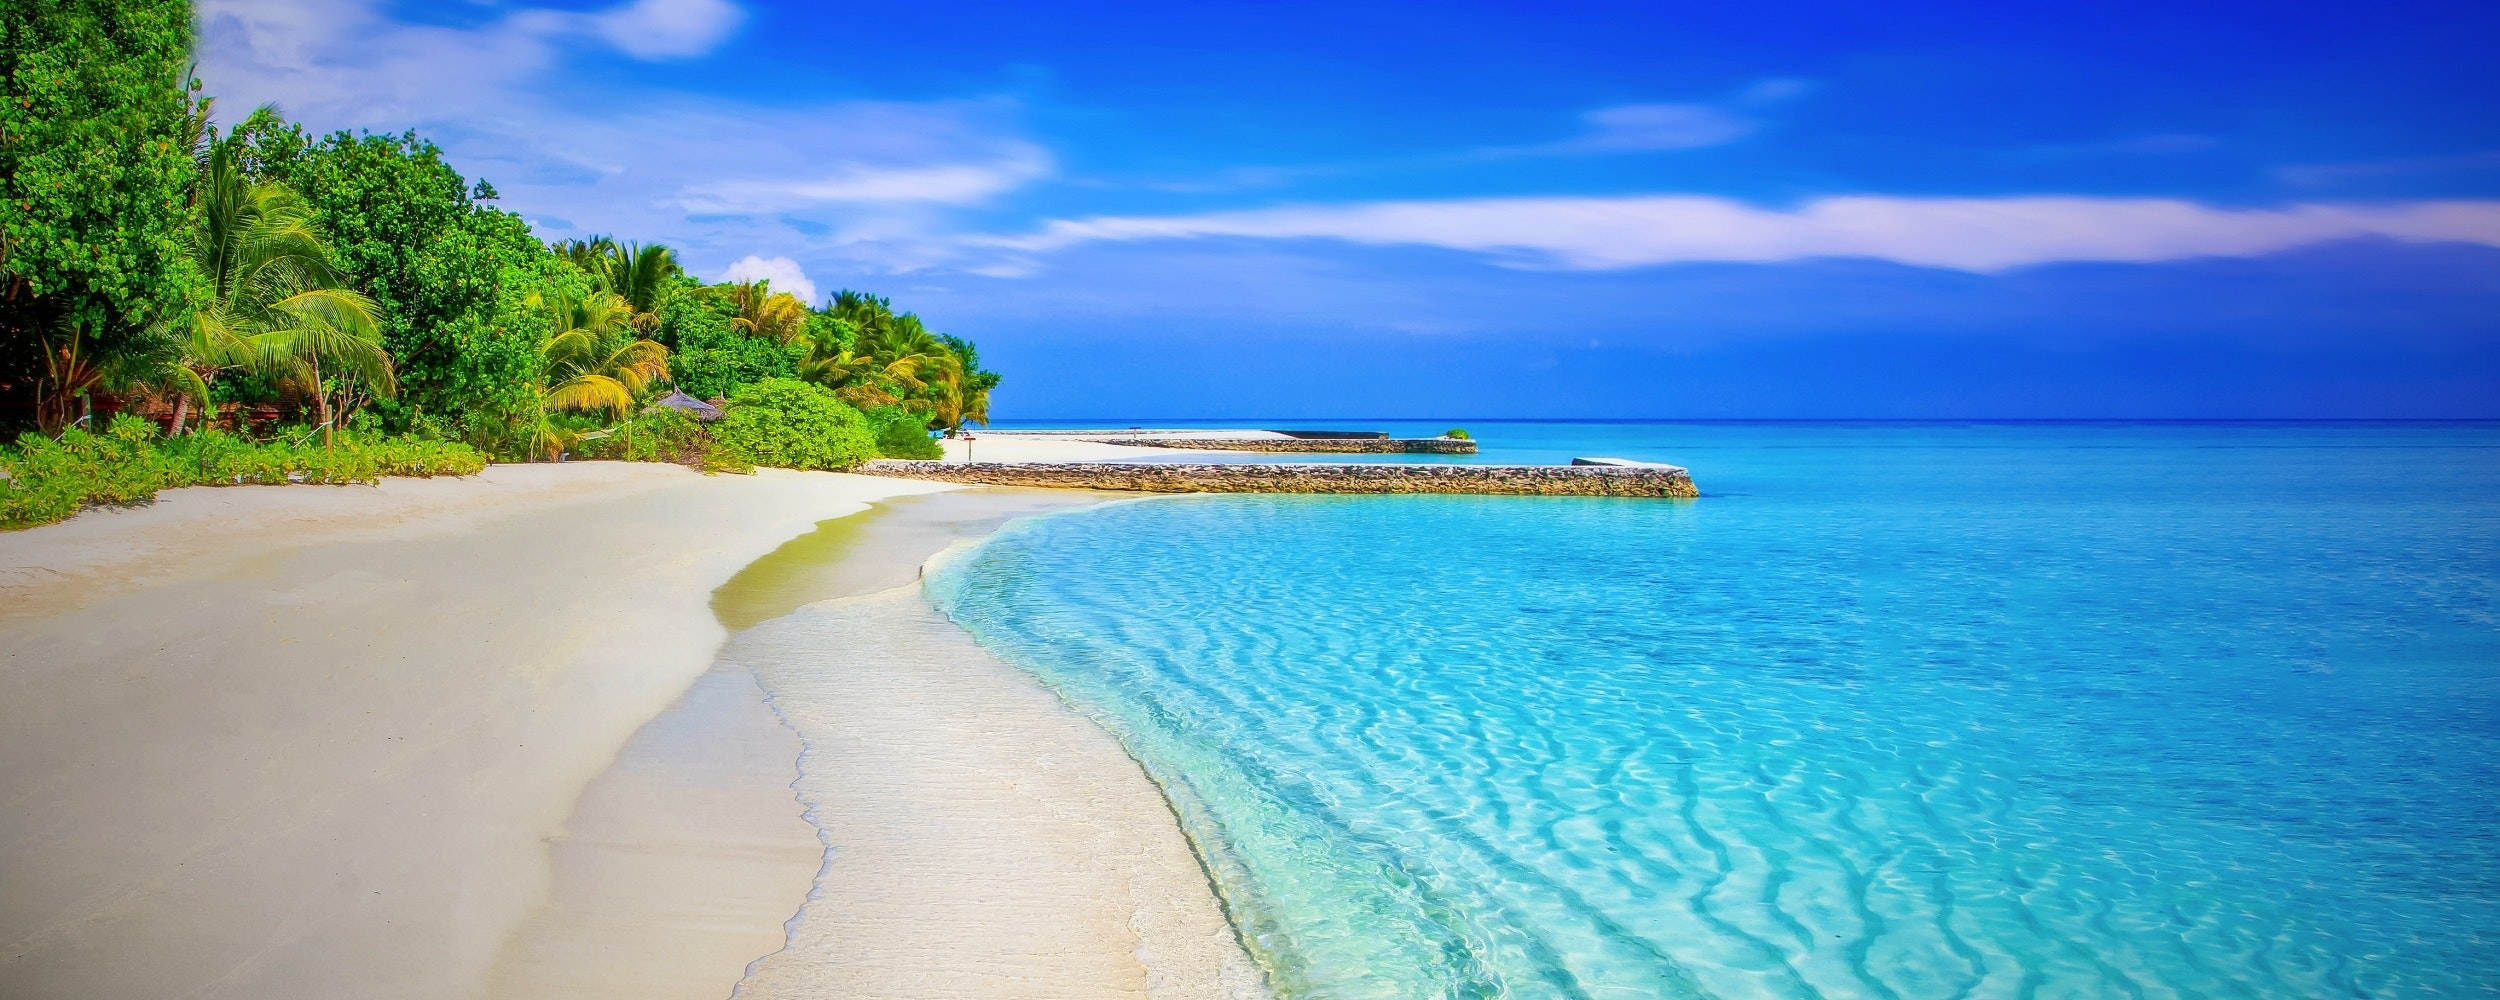 Dominican Republic Beach Destination Wedding